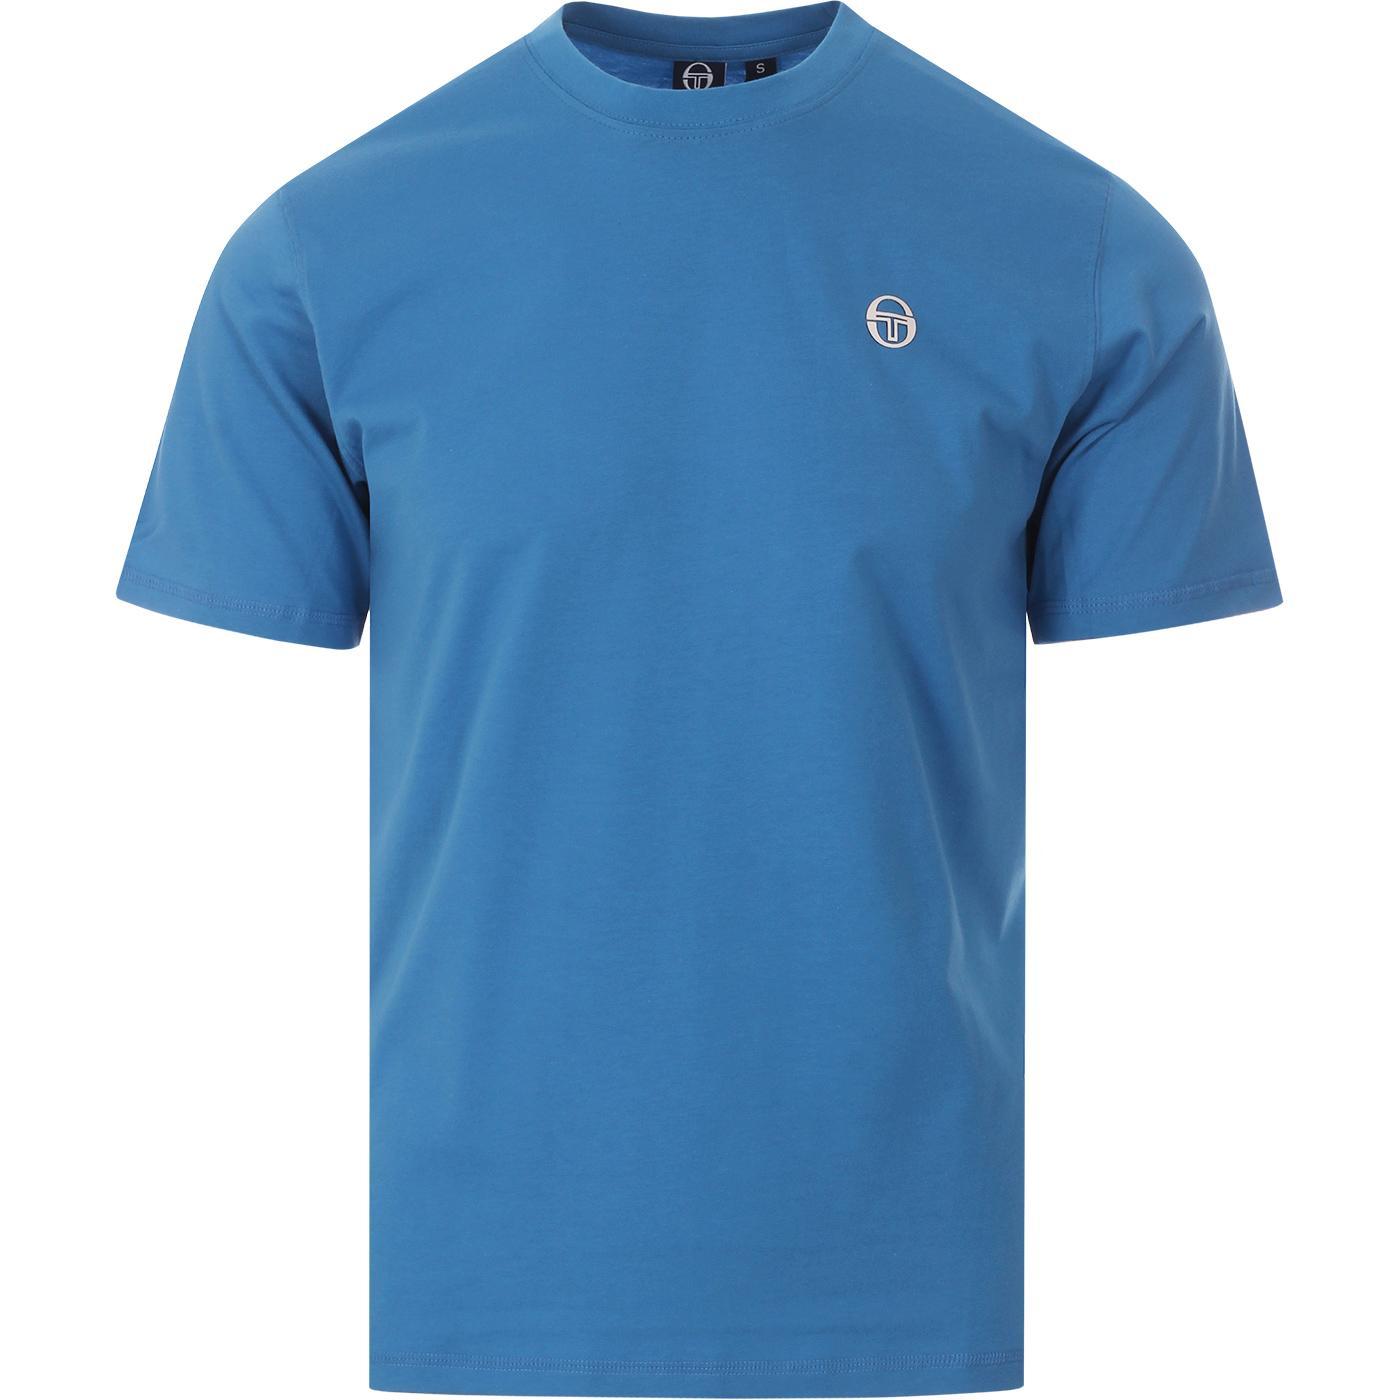 Run 020 SERGIO TACCHINI Retro Logo Tee BLUE/WHITE